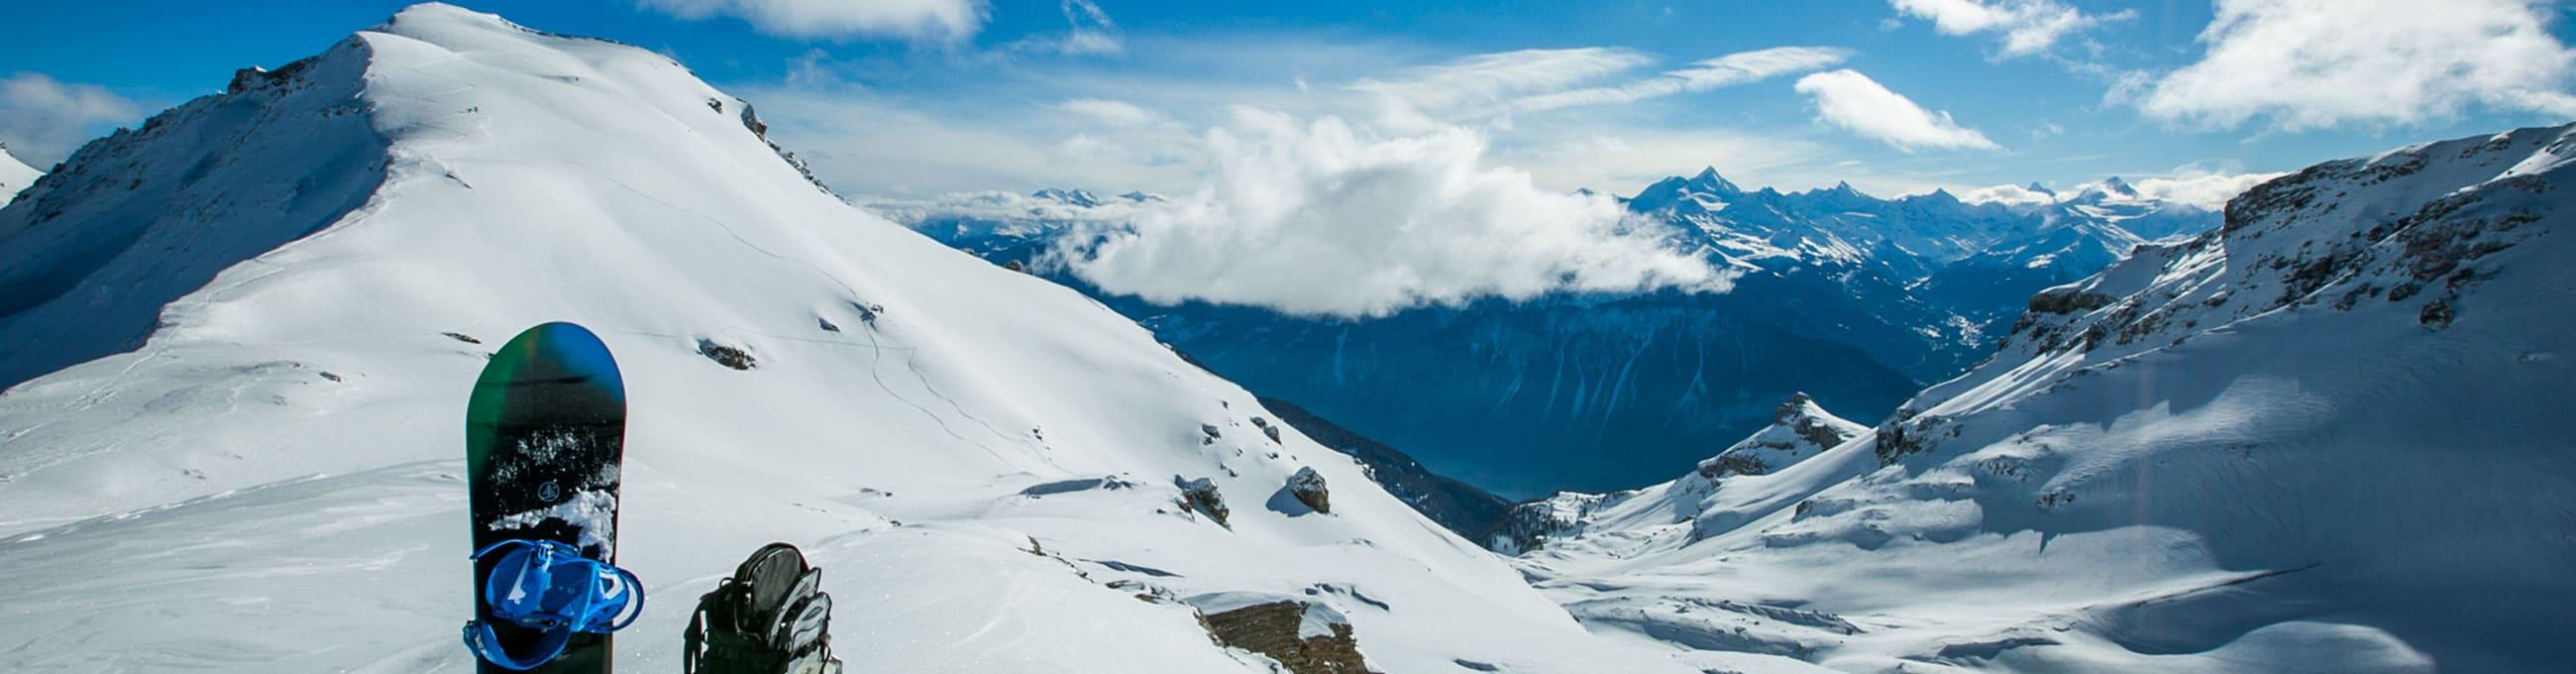 swisskisafari-snowboarding-safari